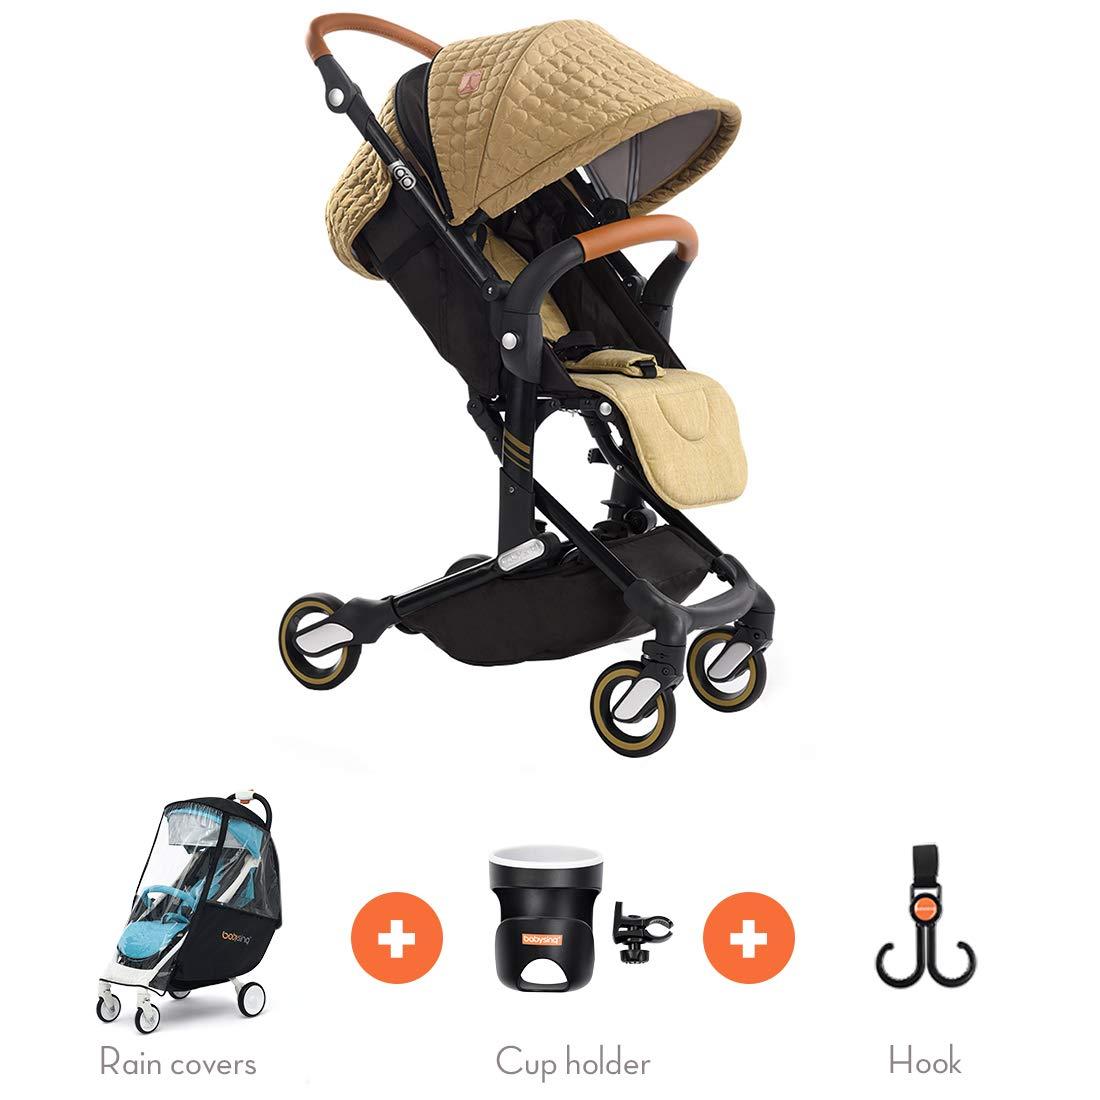 New Arrival—Babysing high Landscape Stroller Baby Stroller Four Seasons Universal Folding cart Baby Stroller I-go (English Khaki Color)